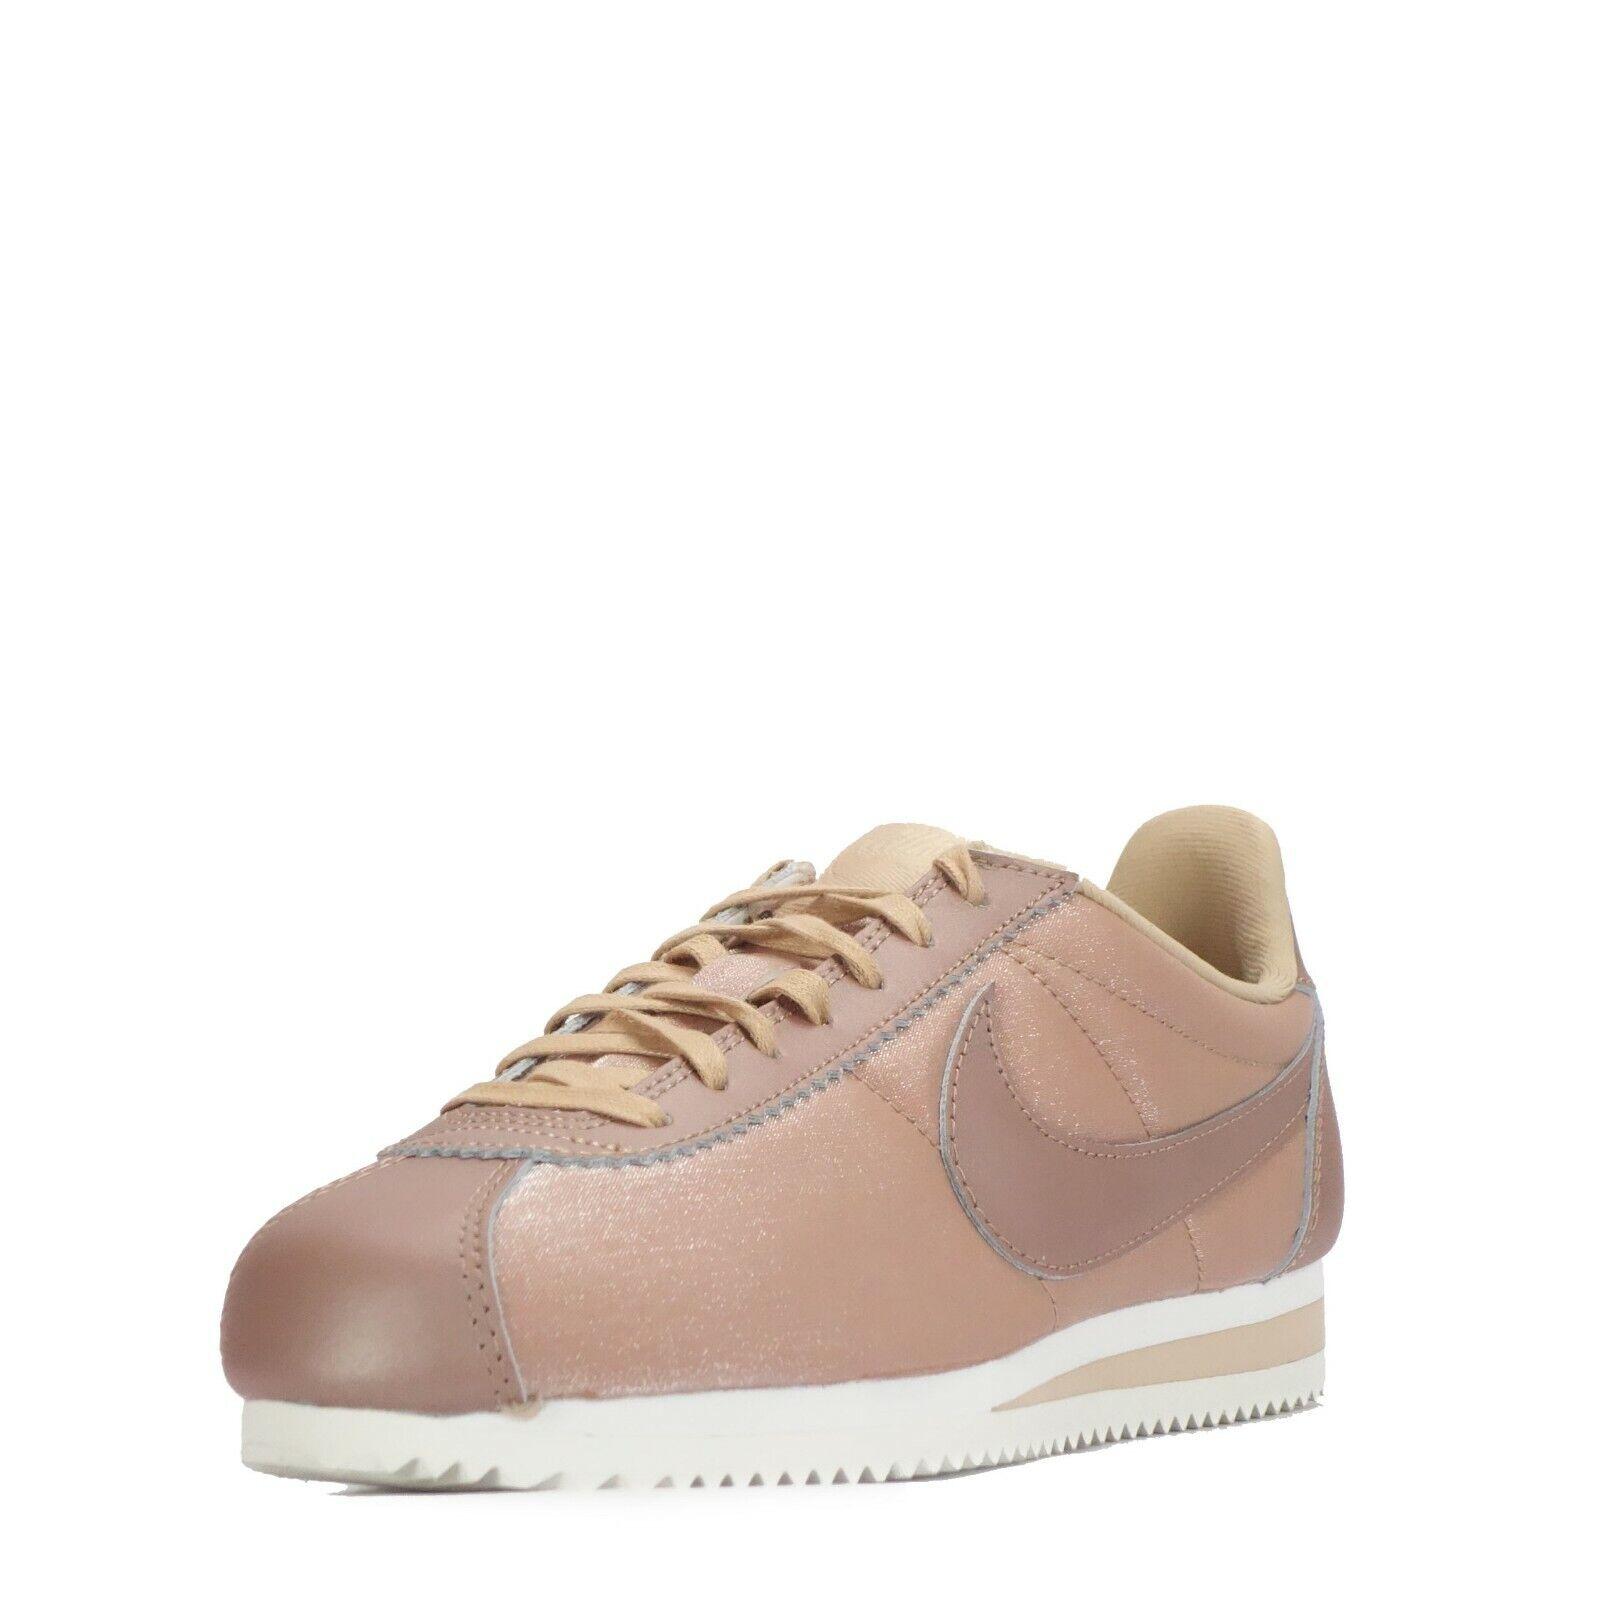 Nike Nike Nike Classic Cortez Premium Para Mujer Zapatillas Bronce Metálico d538ce